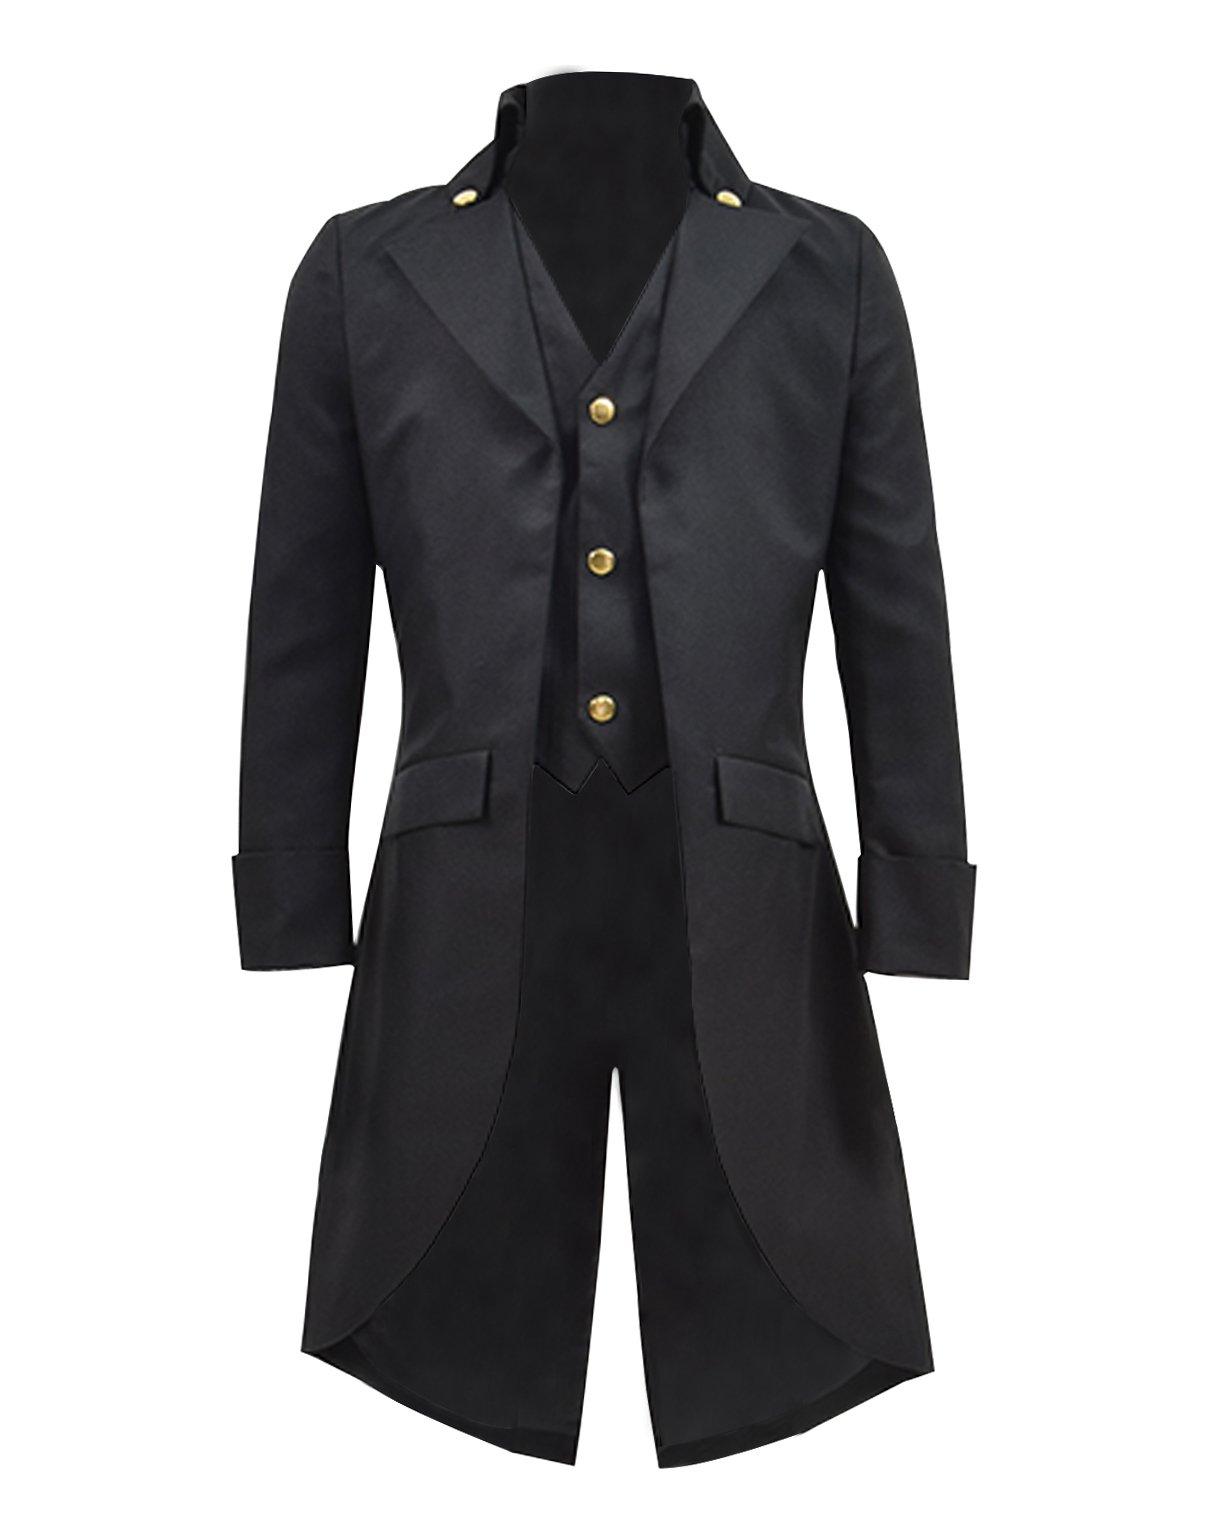 Very Last Shop Boys Gothic Tailcoat Jacket Black Steampunk Victorian Long Coat Vampire Costume (Black, 10)